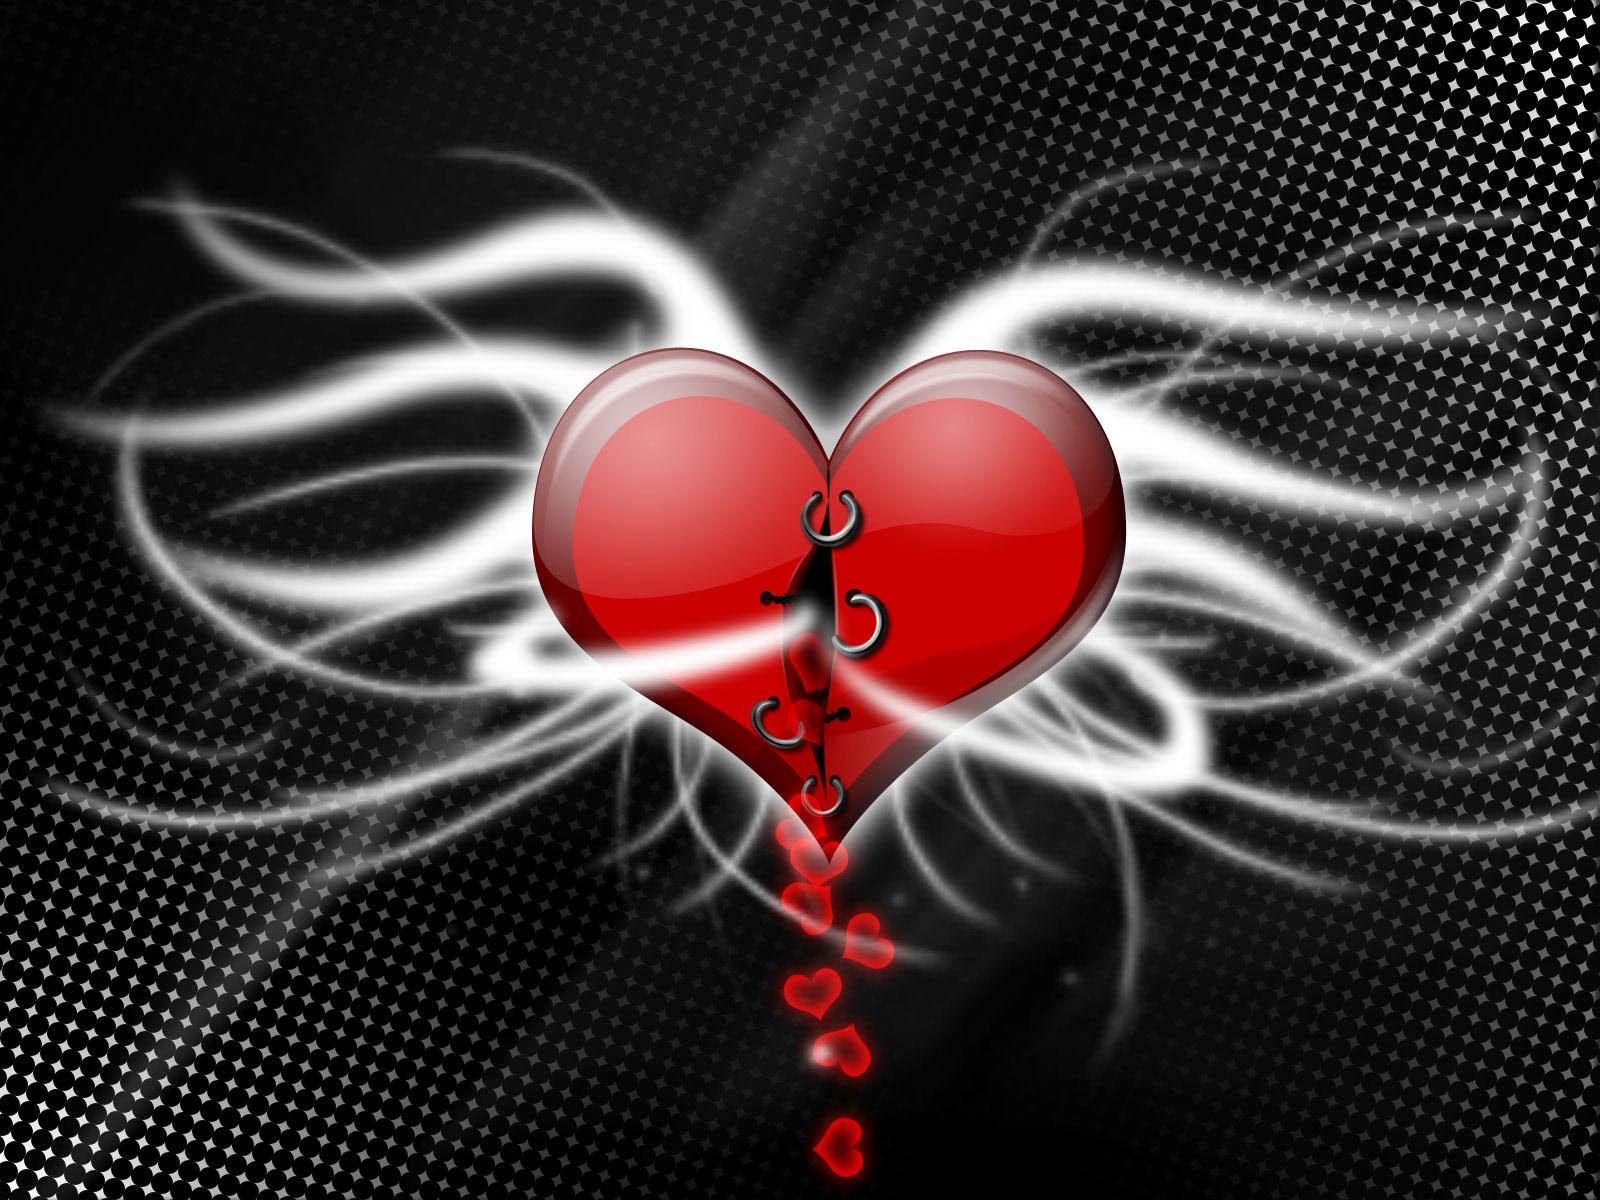 broken heart hd wallpaper,heart,red,love,organ,heart